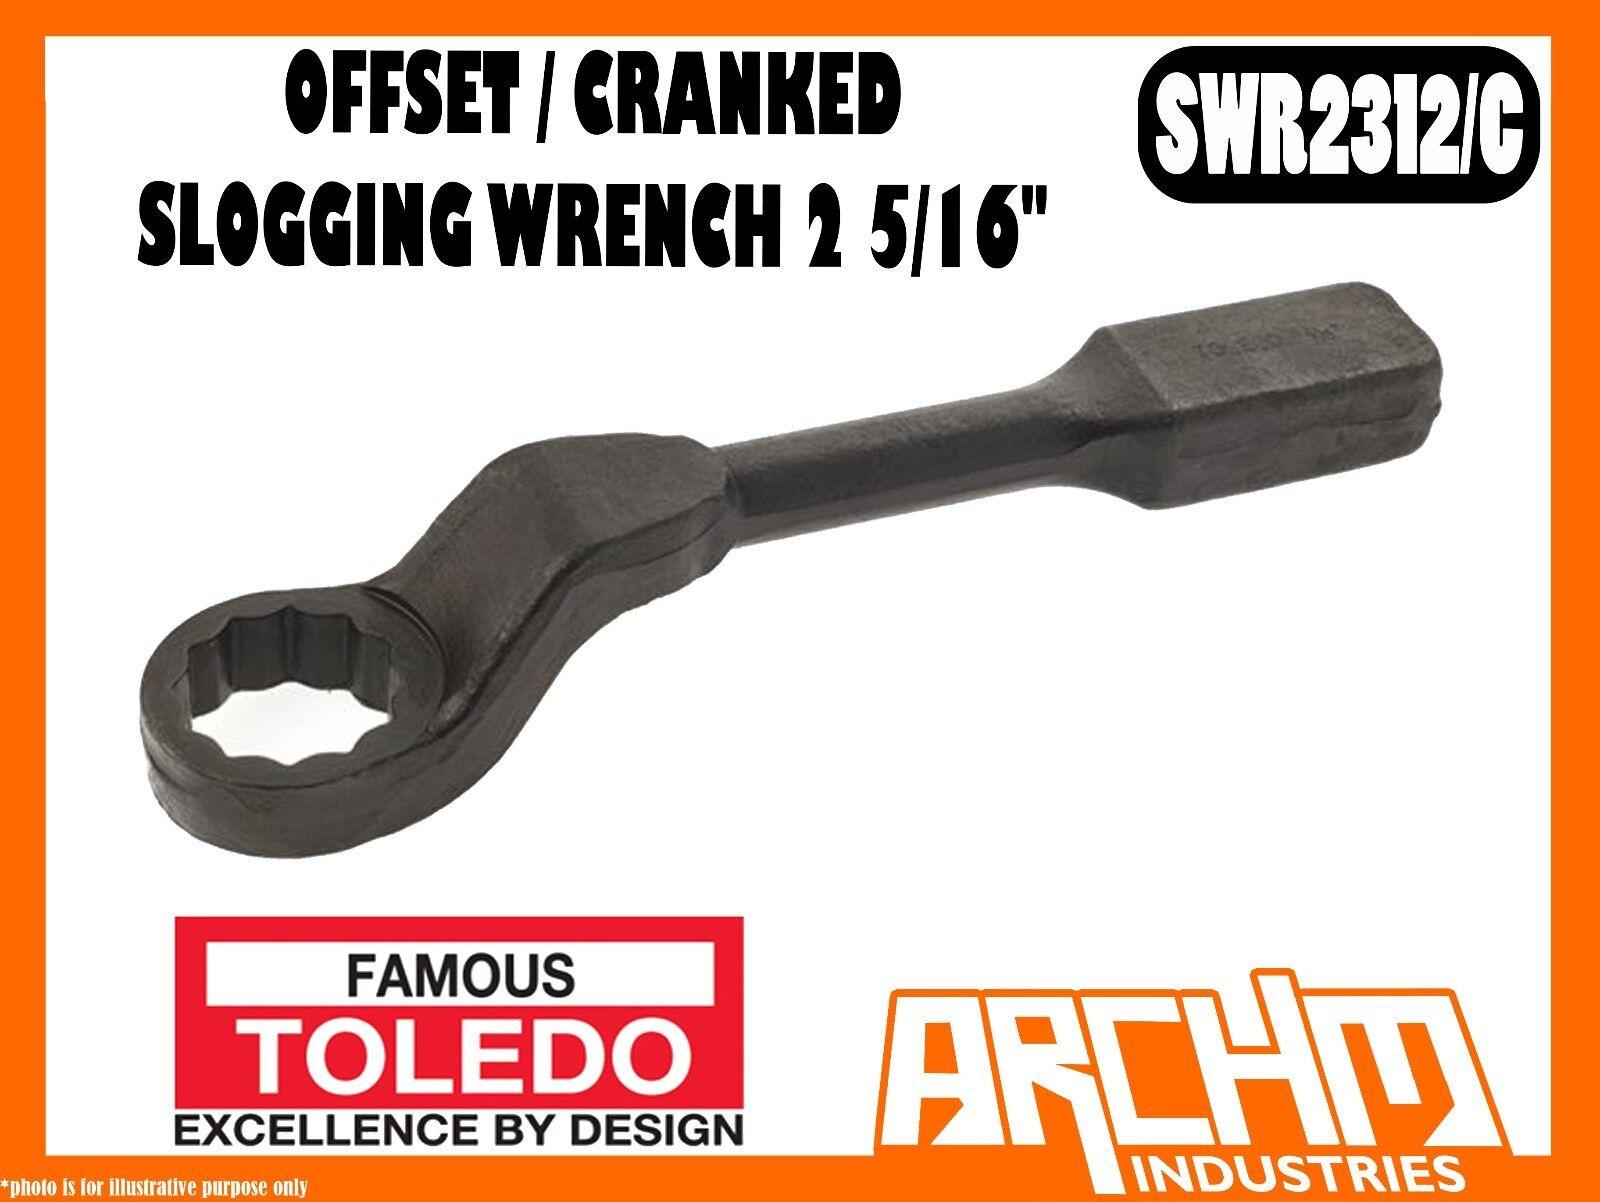 TOLEDO SWR2312 C - OFFSET   CRANKED SLOGGING WRENCH 2 5 16